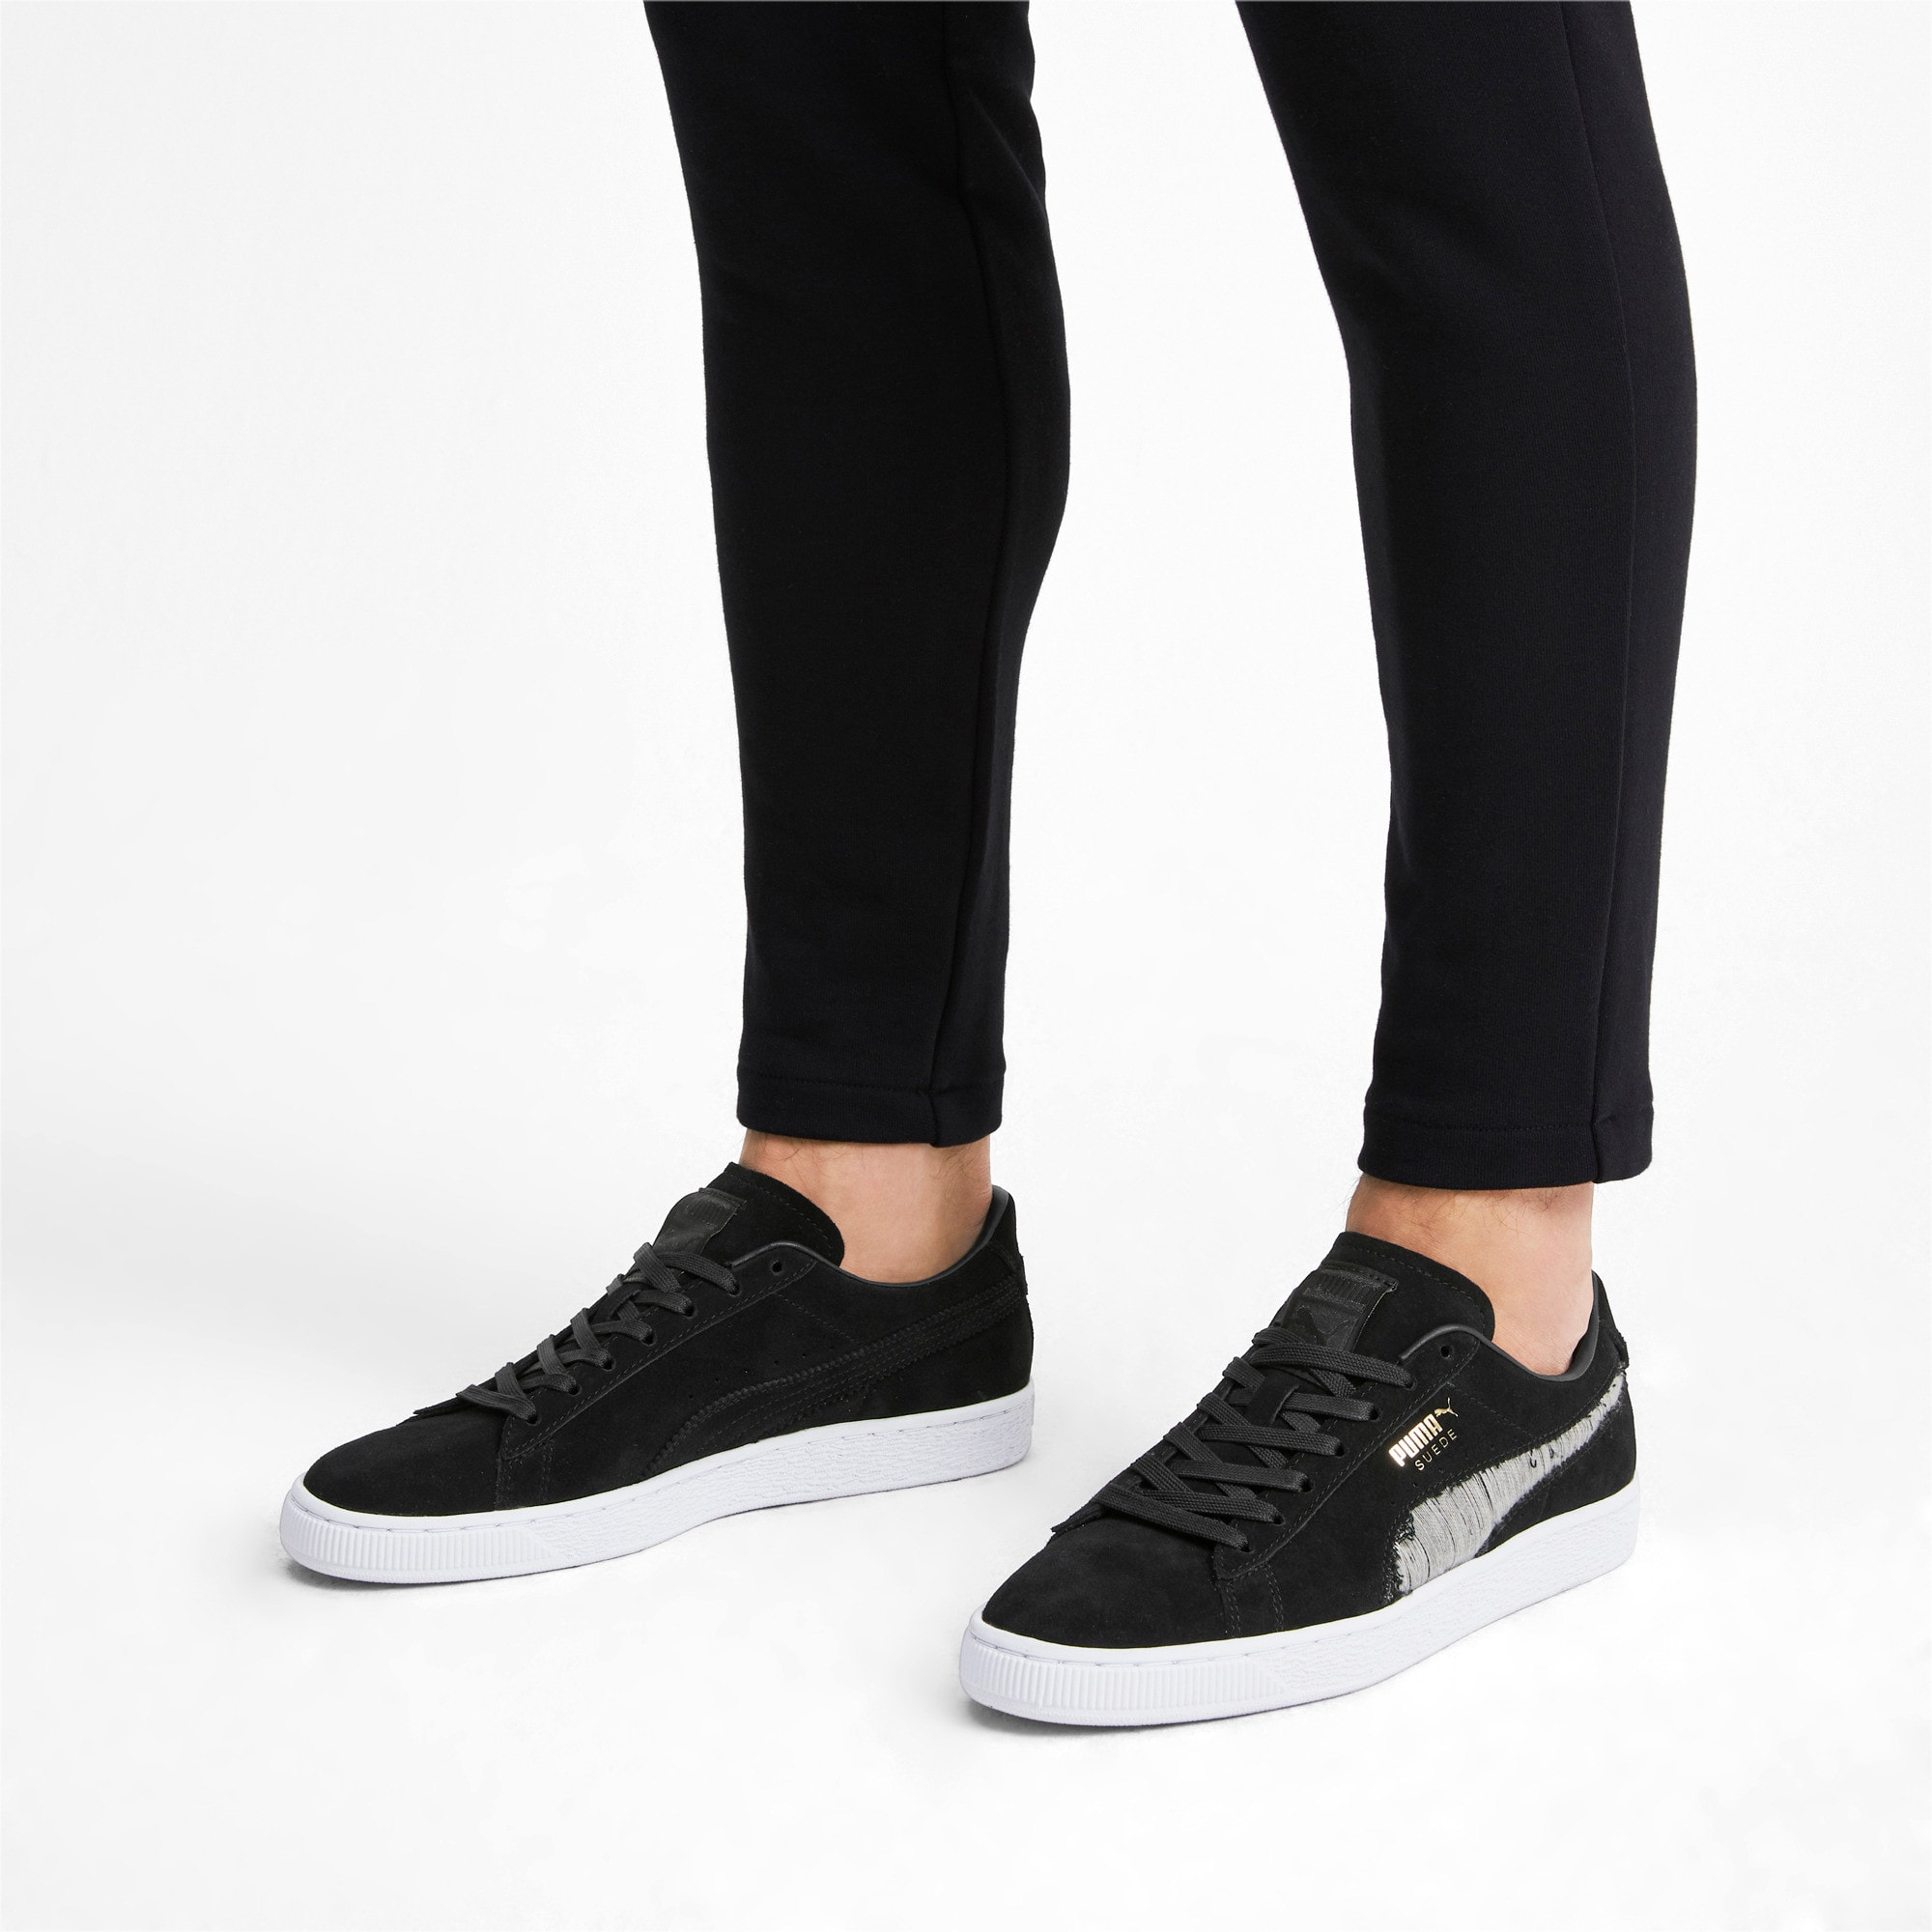 Thumbnail 3 of Suede Ripped Denim Sneakers, Puma Black-P Black-P White, medium